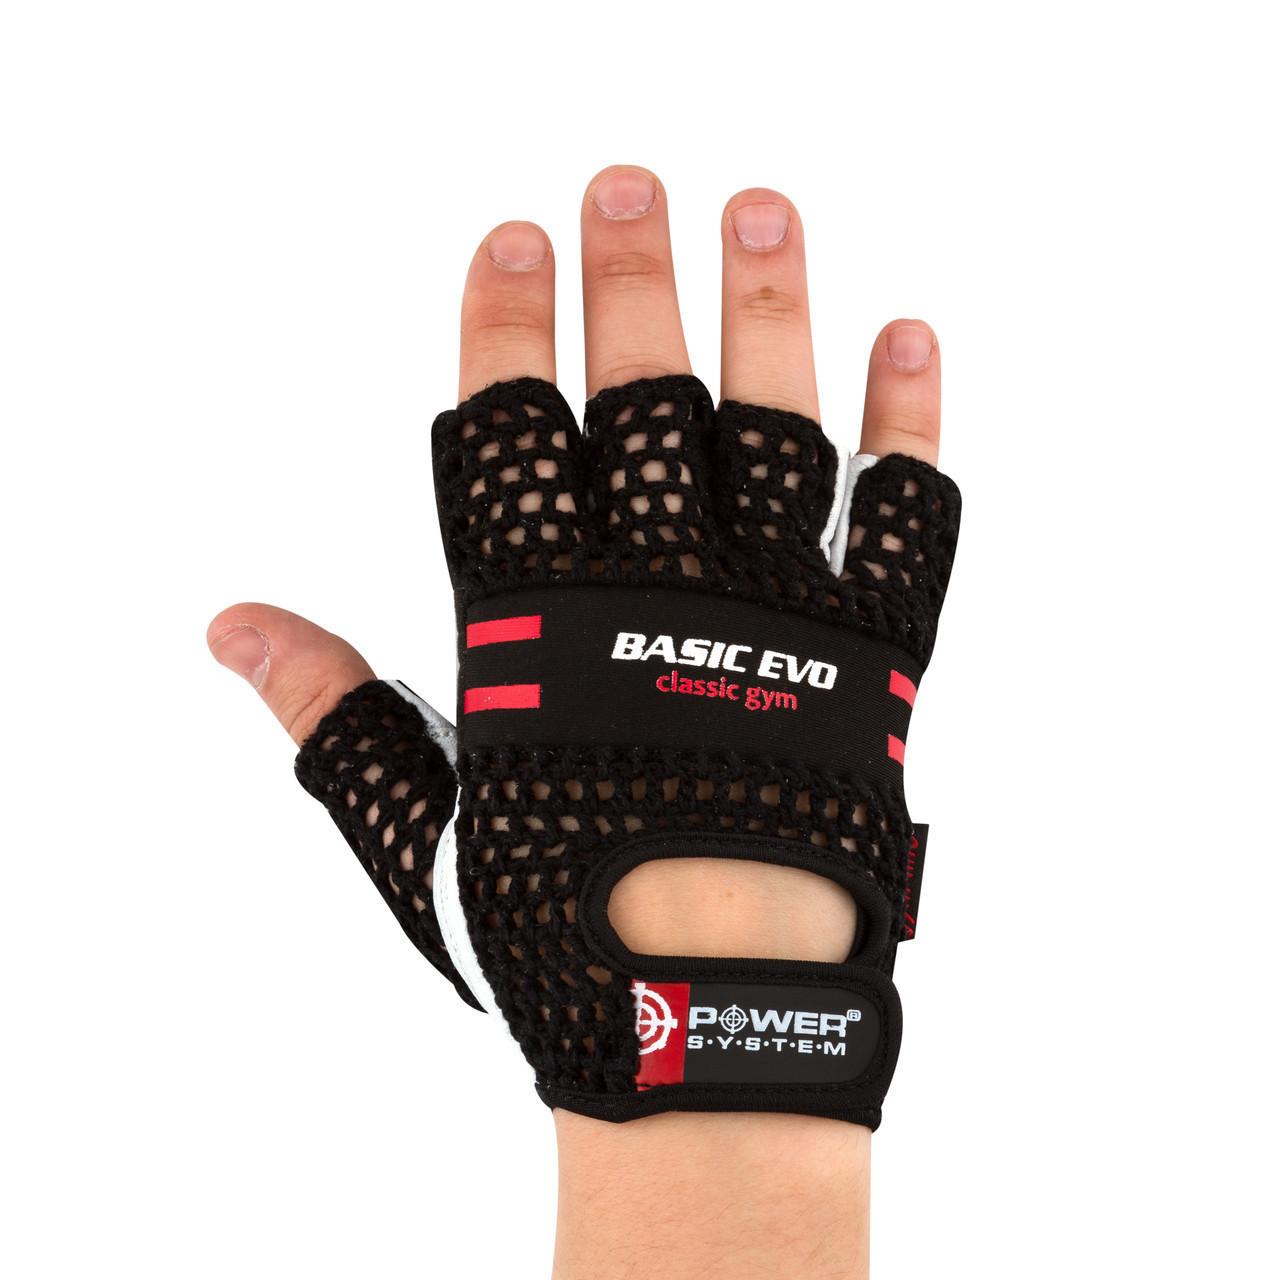 Перчатки для фитнеса и тяжелой атлетики Power System Basic EVO PS-2100 L Black/Red Line